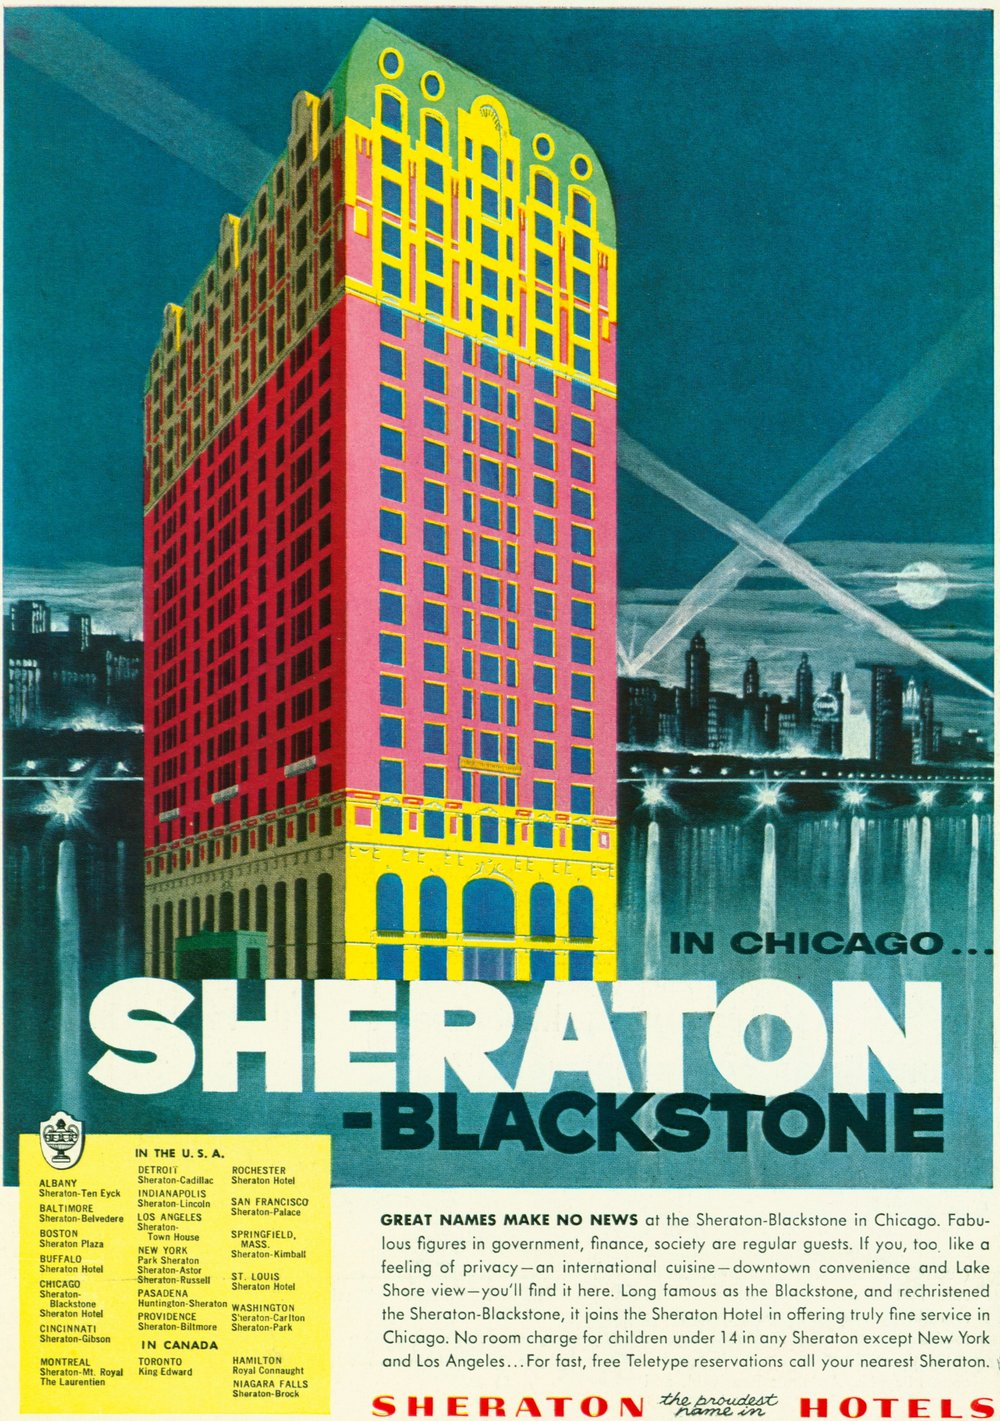 1955 - Sheraton in Chicago